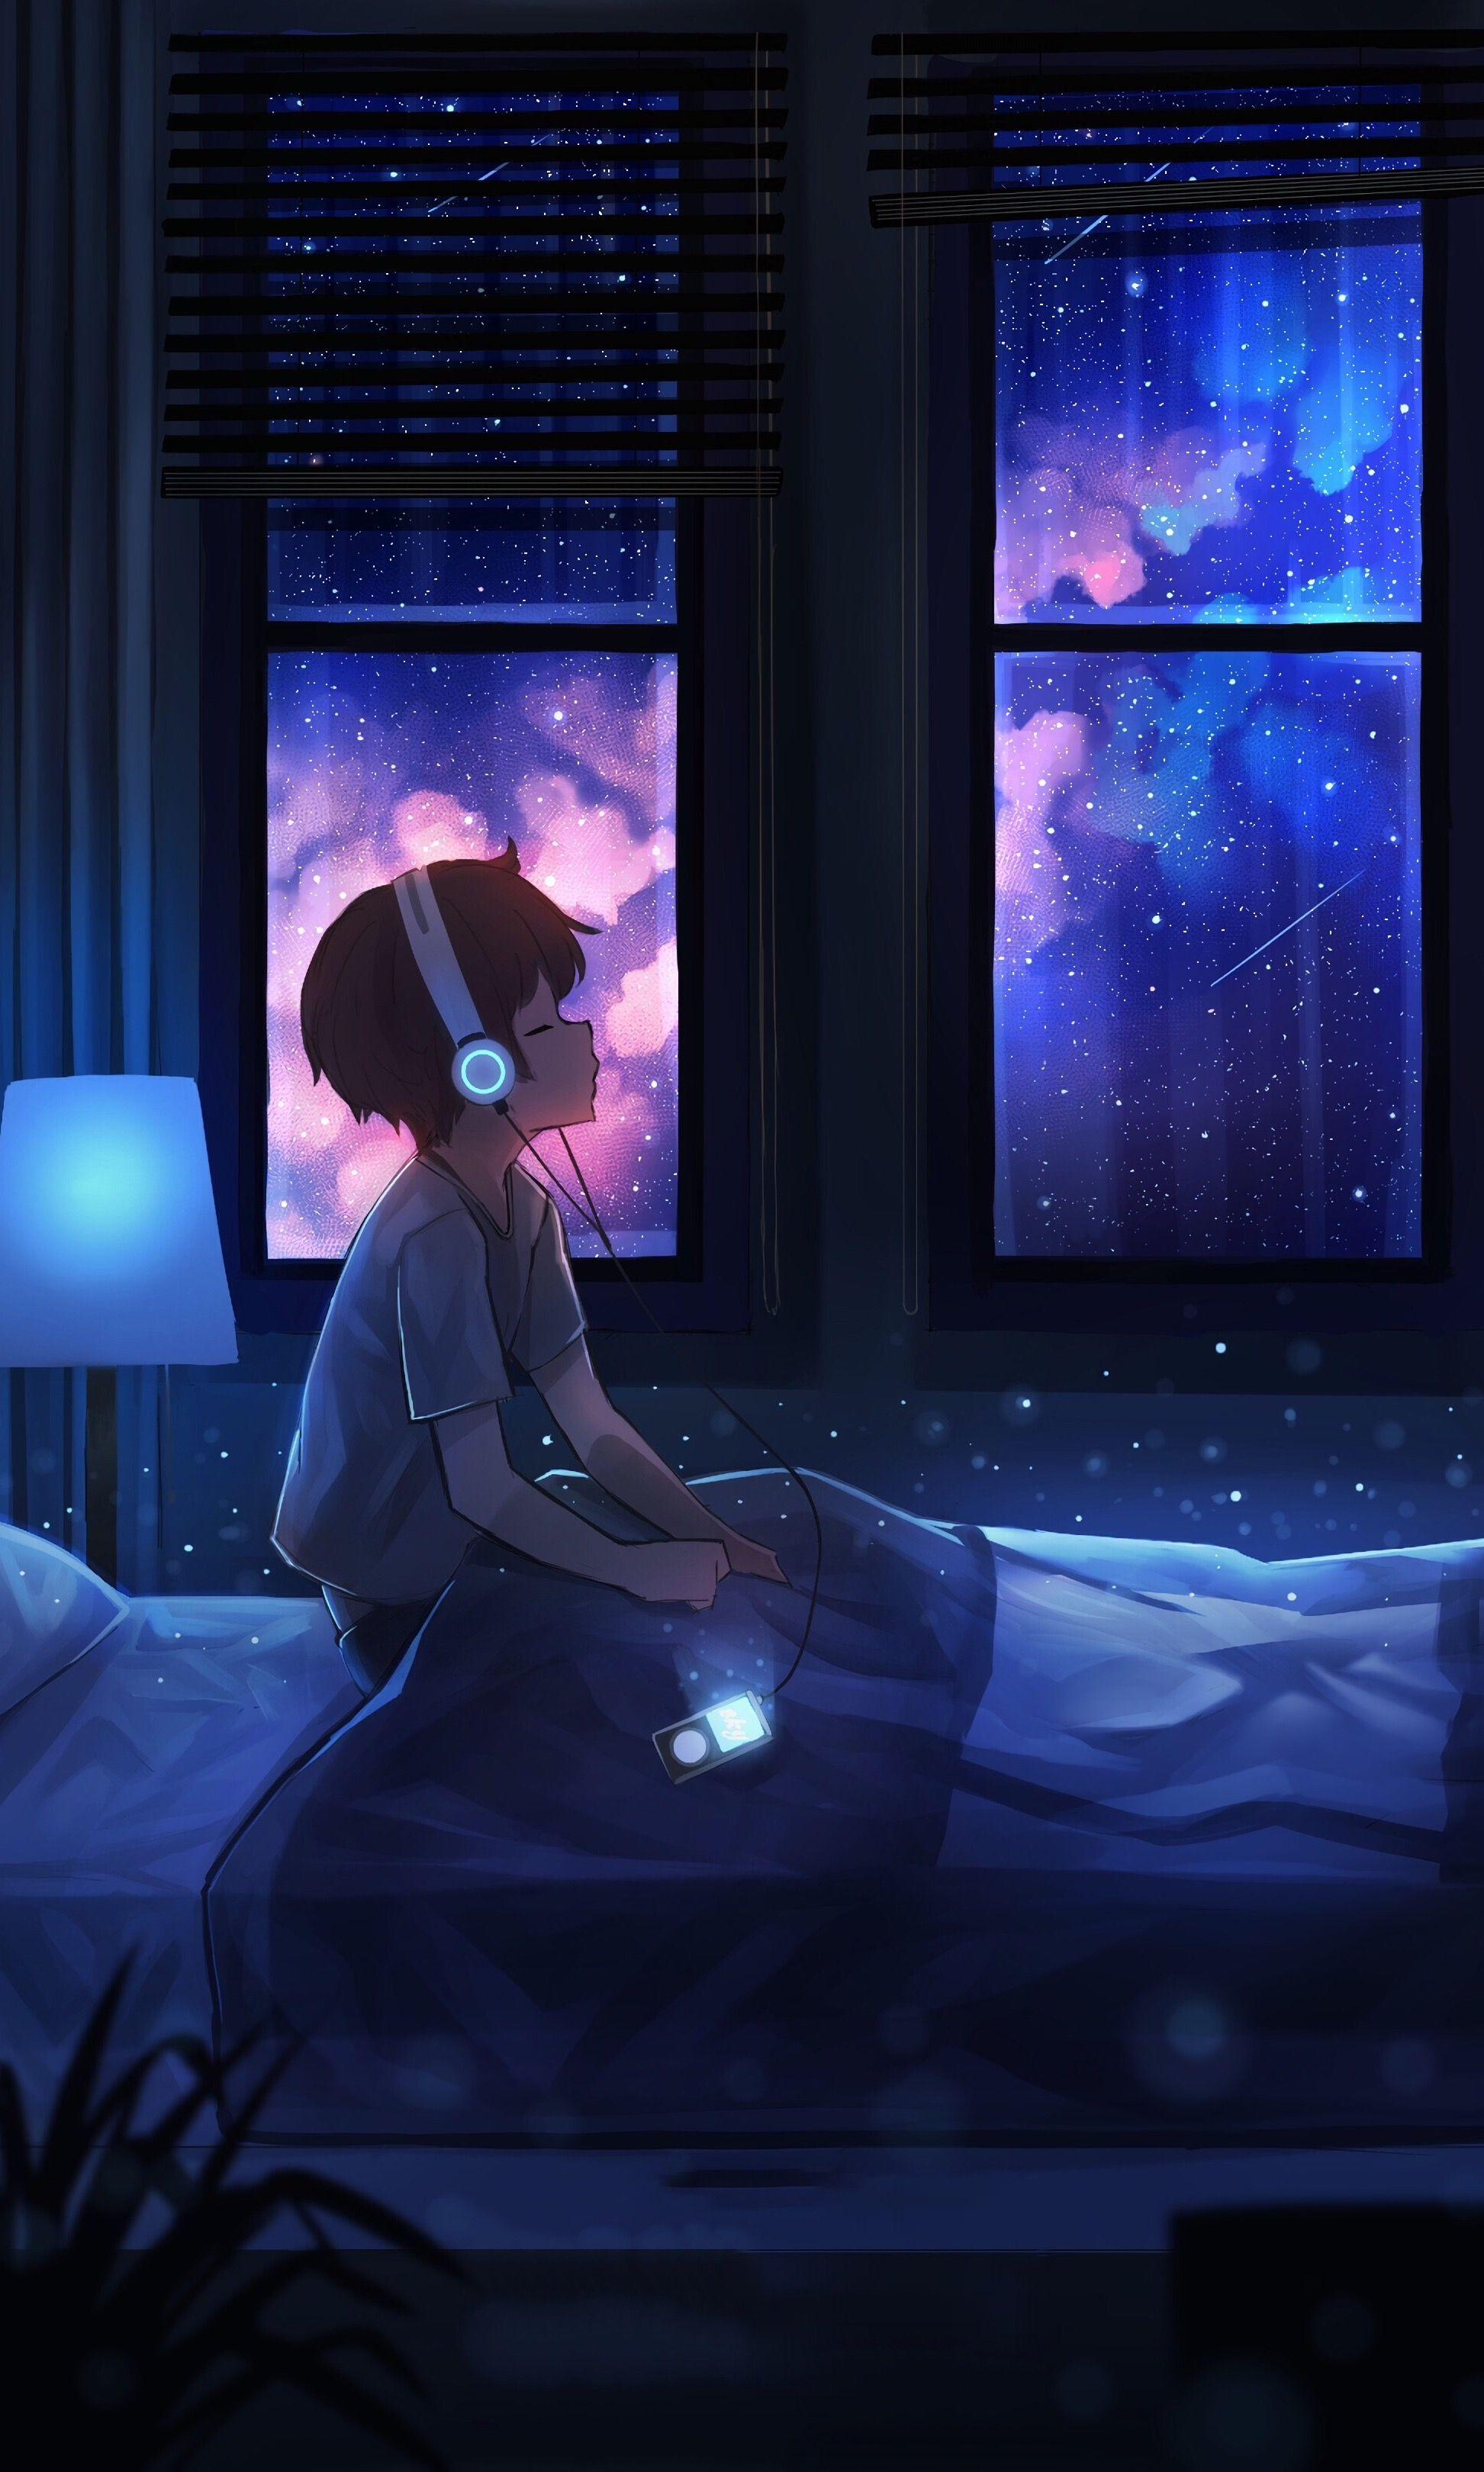 Pin Oleh Sarfaraz Di 3 5 Phone Foto Langit Malam Seni Animasi Bintang Jatuh